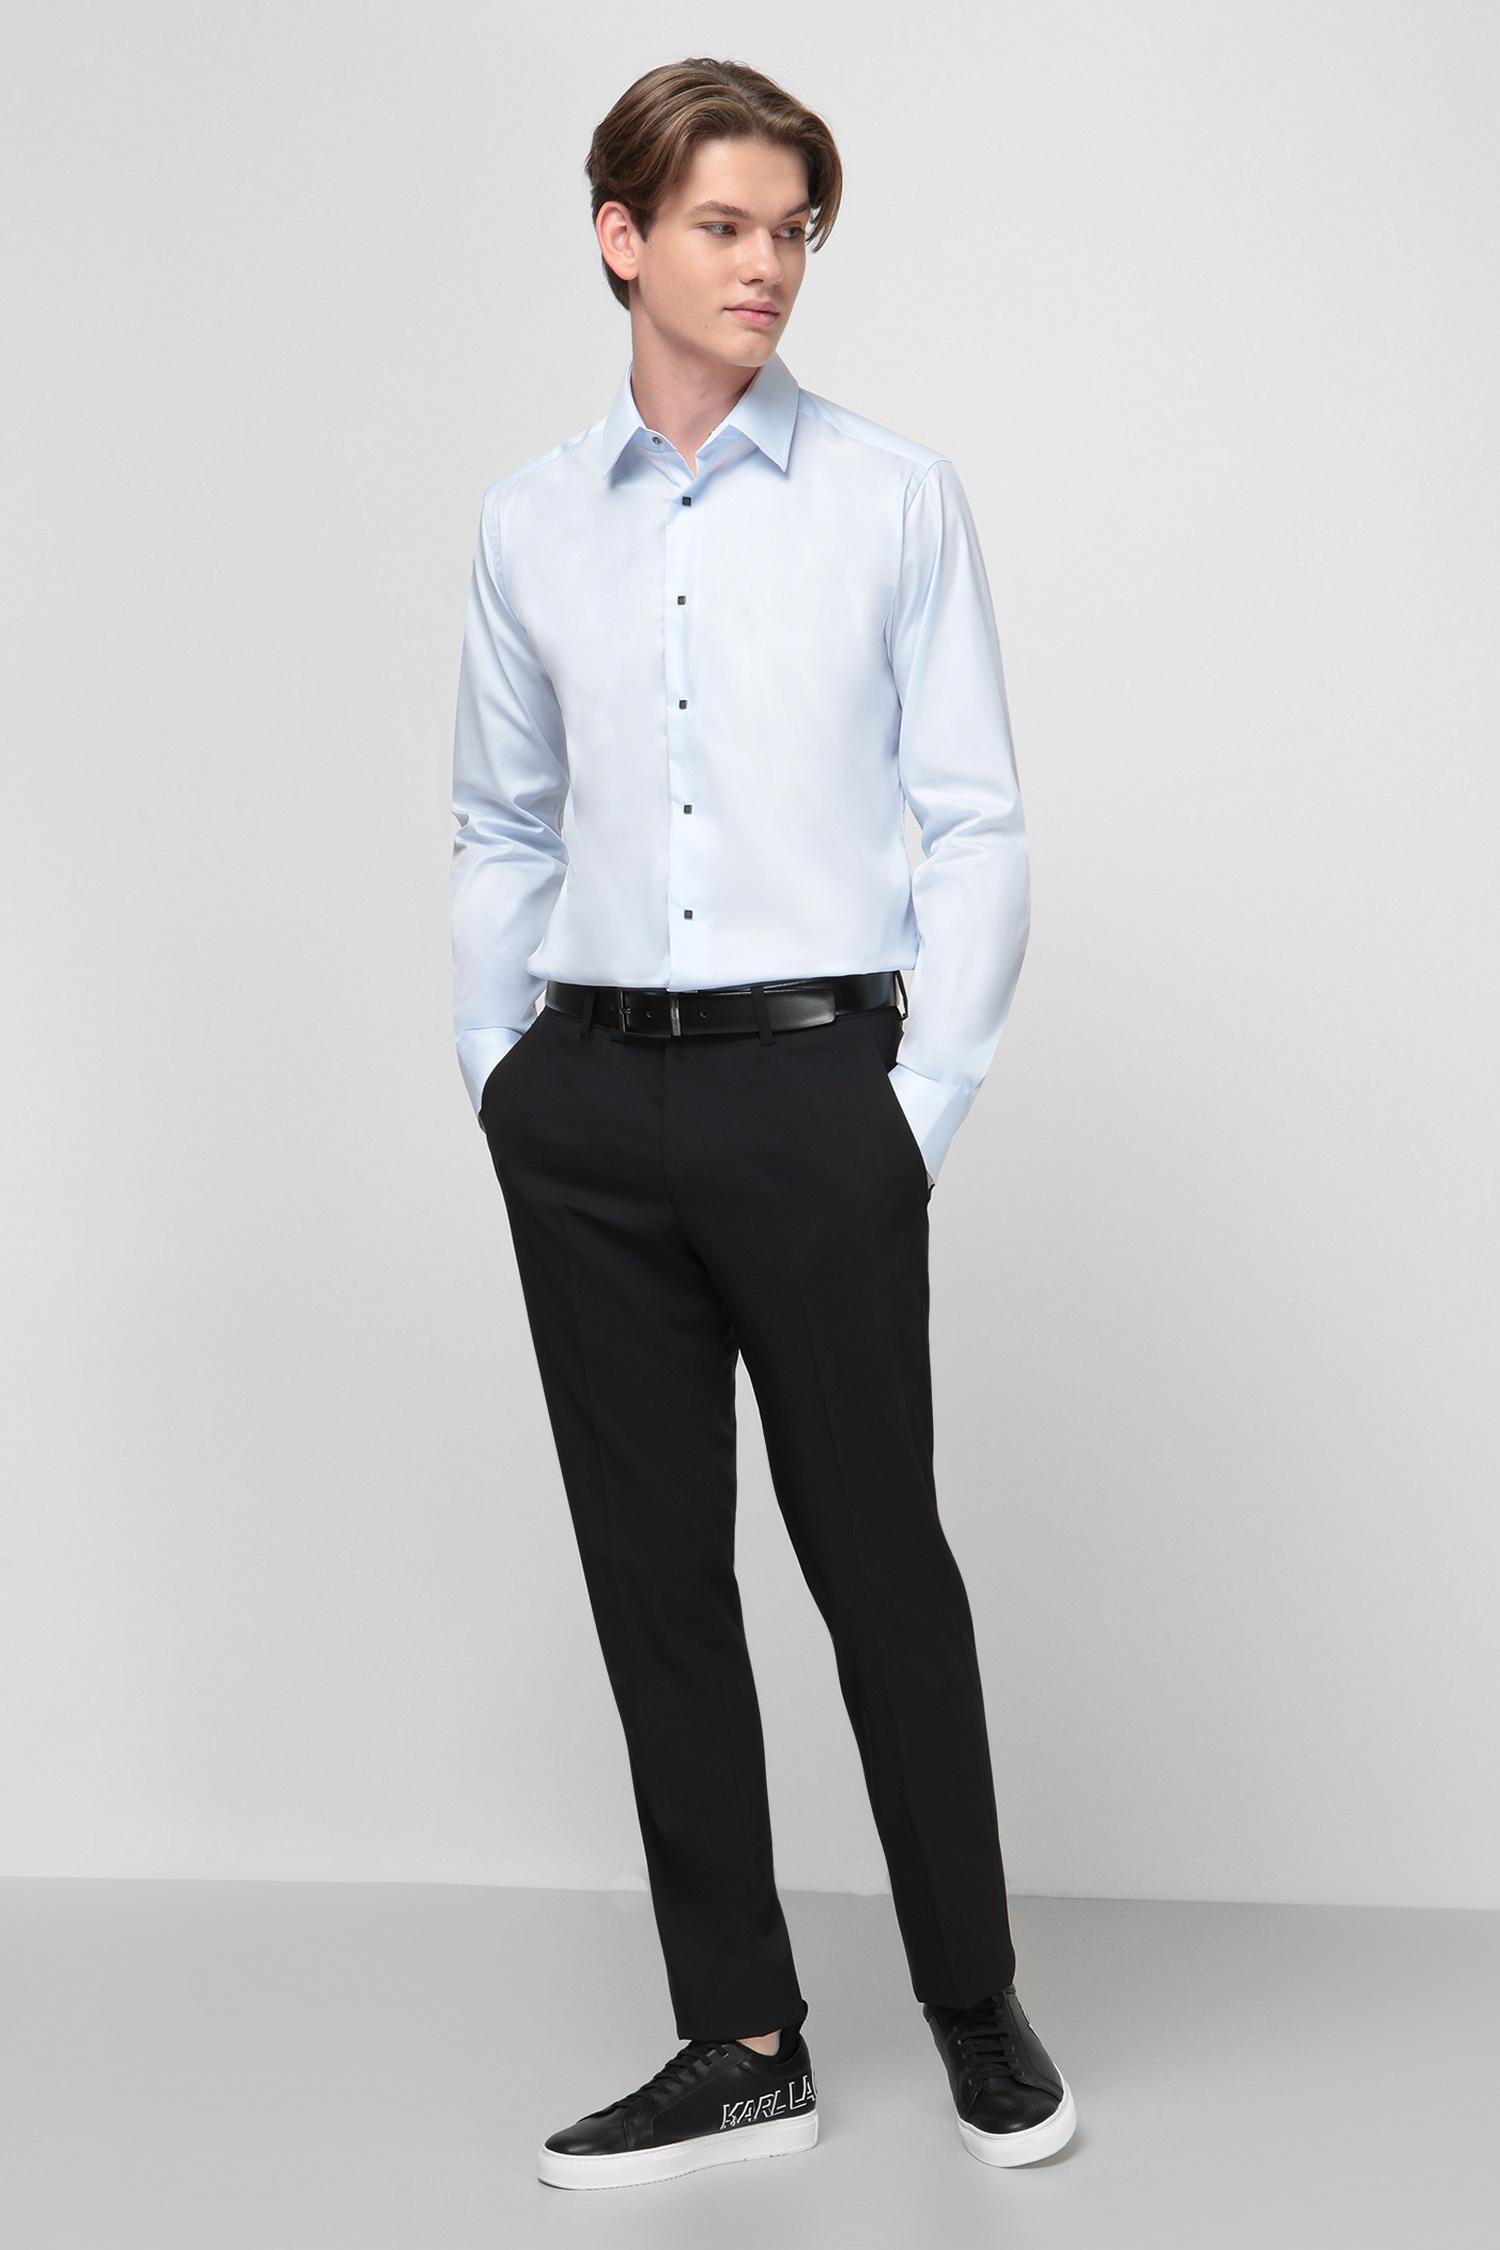 Голубая рубашка для парней Karl Lagerfeld 500699.605000;620